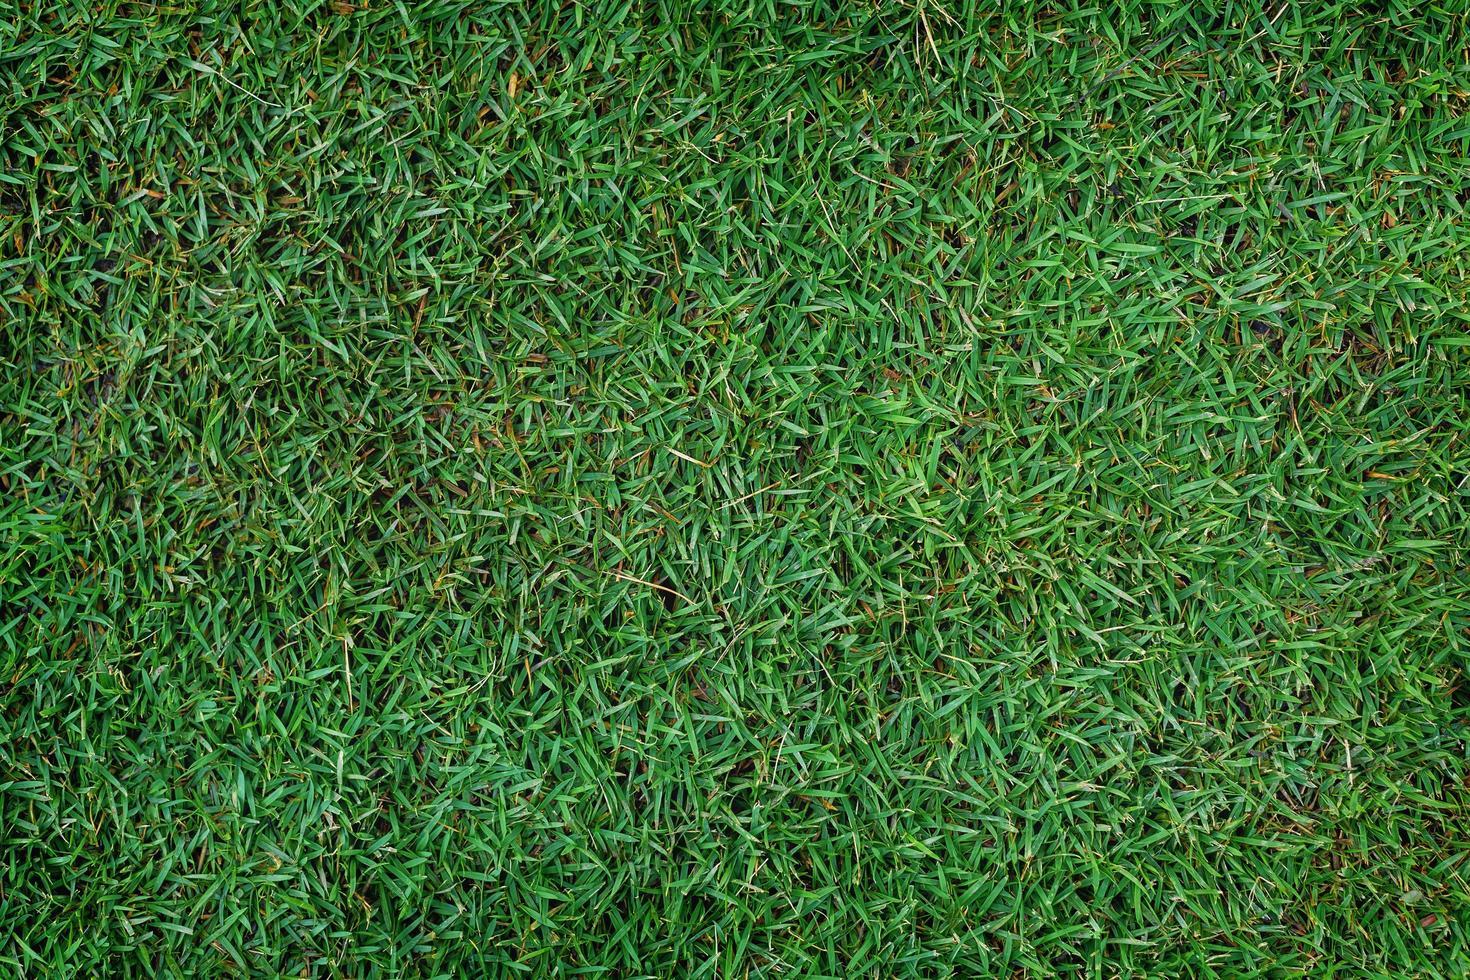 Green grass patch photo